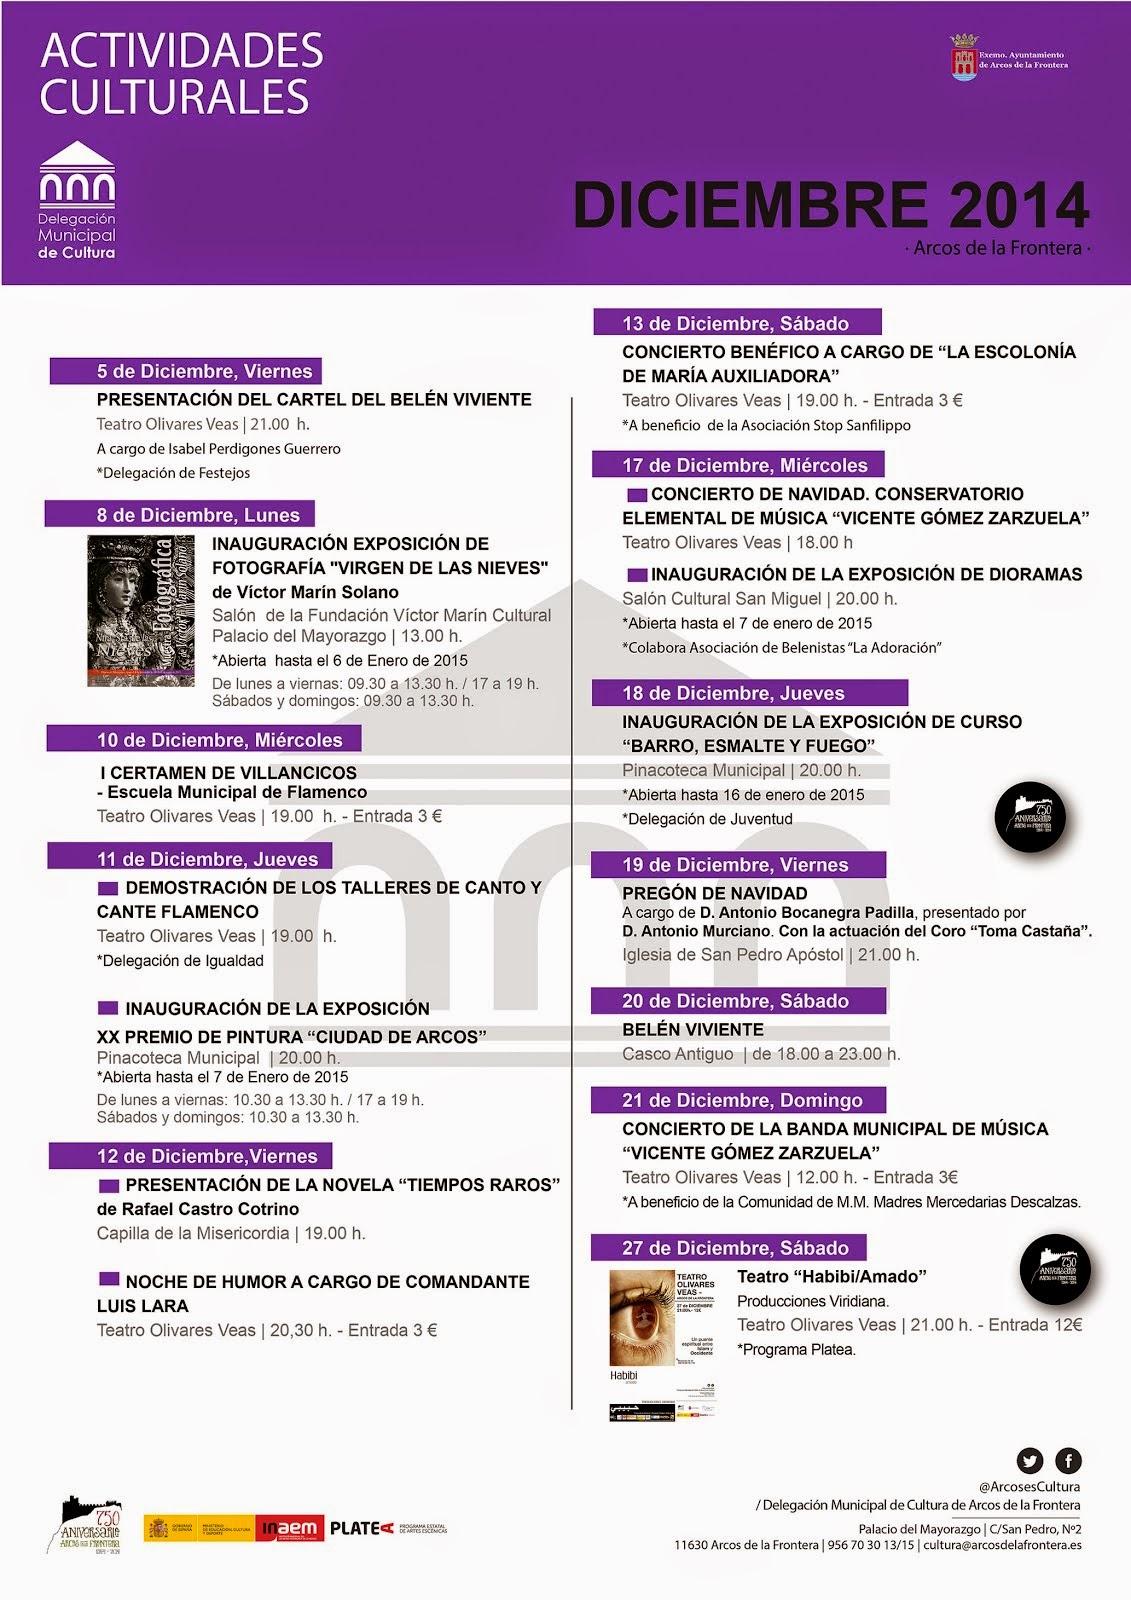 ACTIVIDADES CULTURALES ARCOS DICIEMBRE 2014